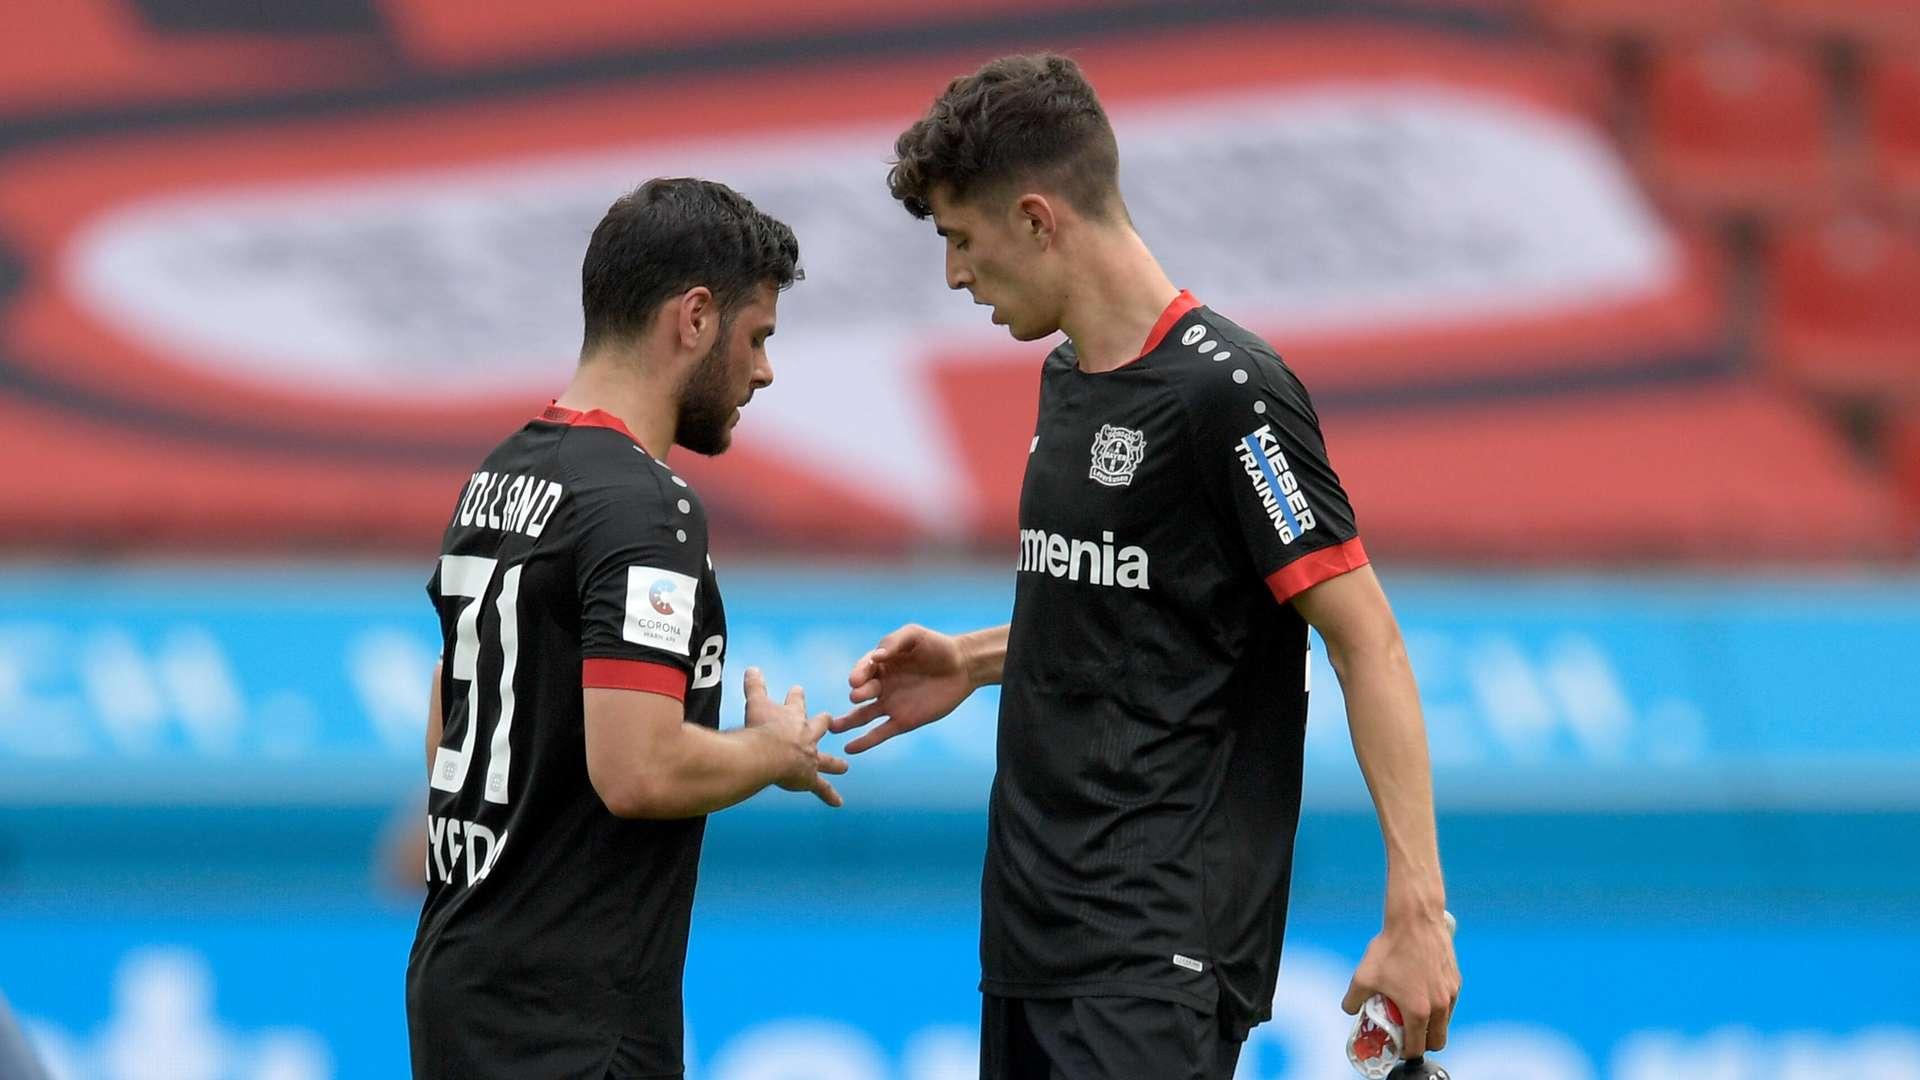 League news in brief: The Werkself end of term report   Bayer04.de